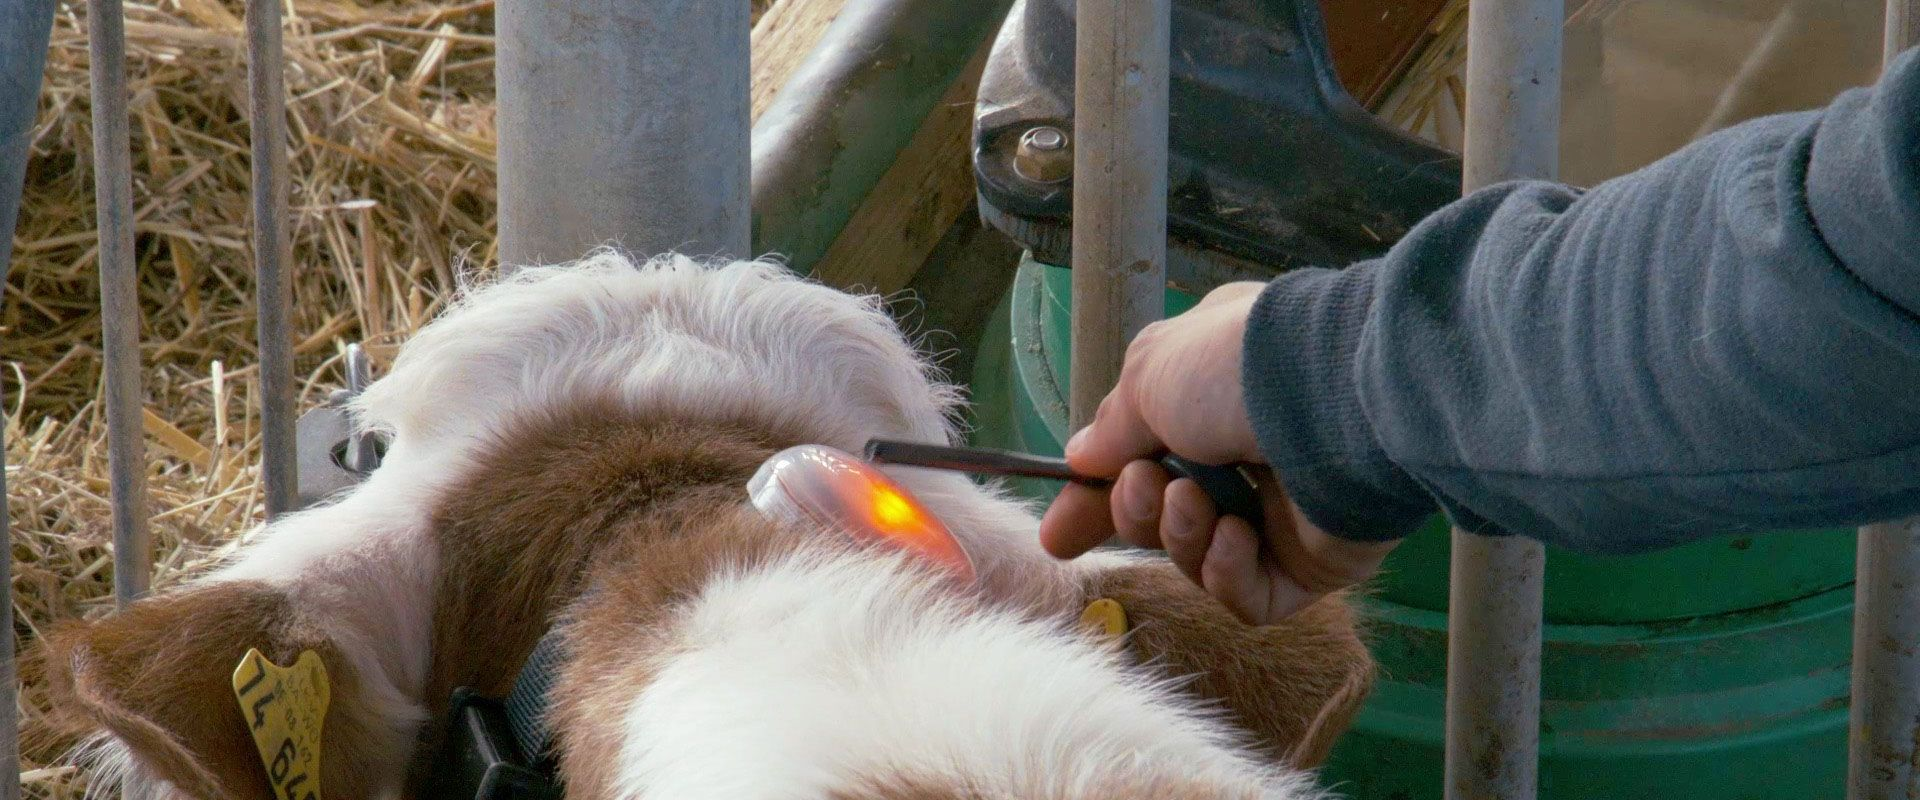 Smart Calf System | Videoproduktion